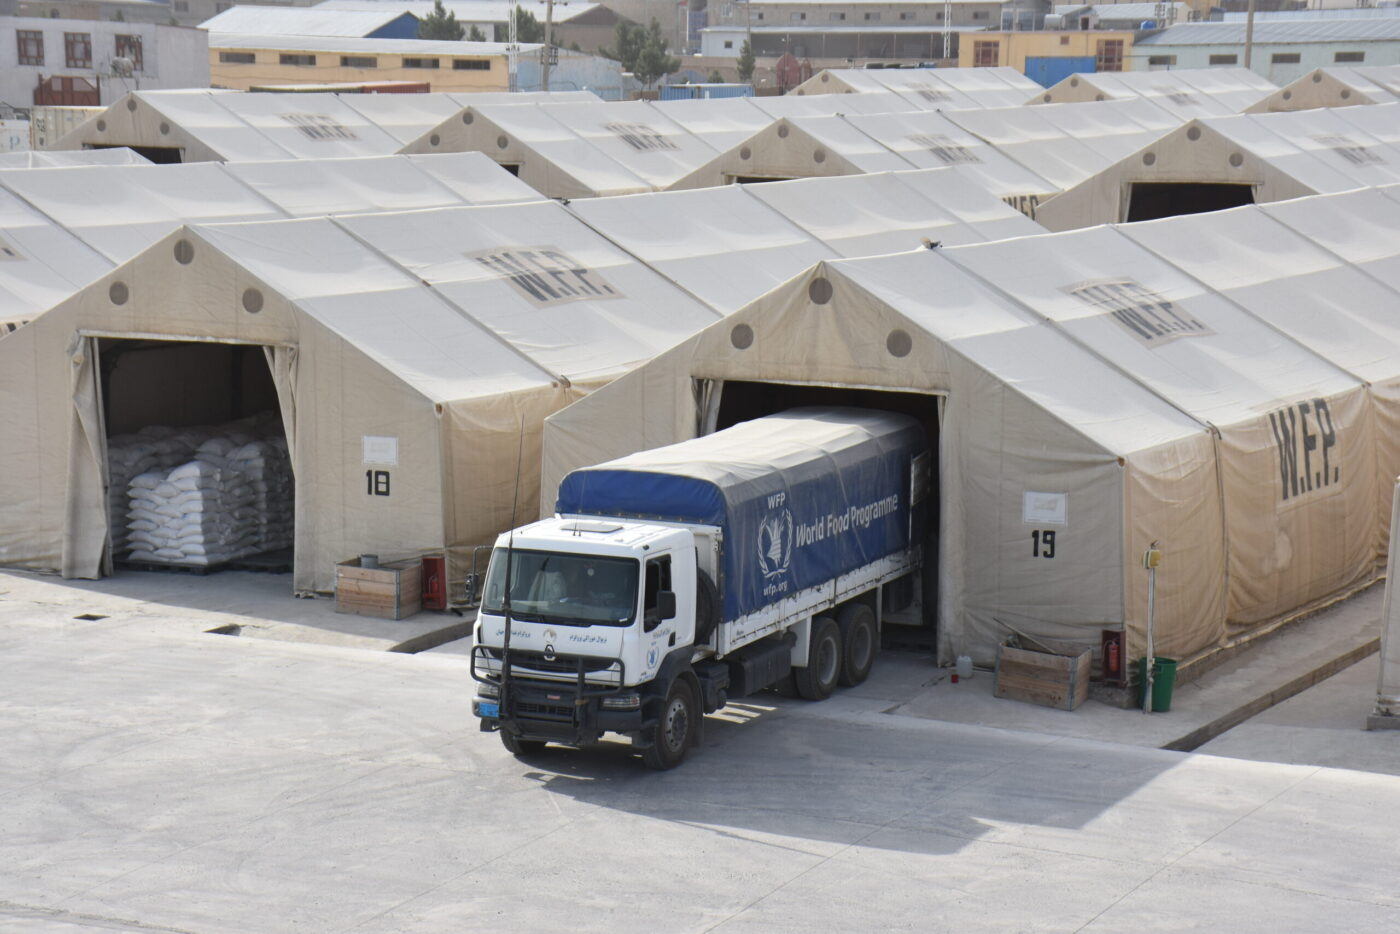 truck exiting a tent building